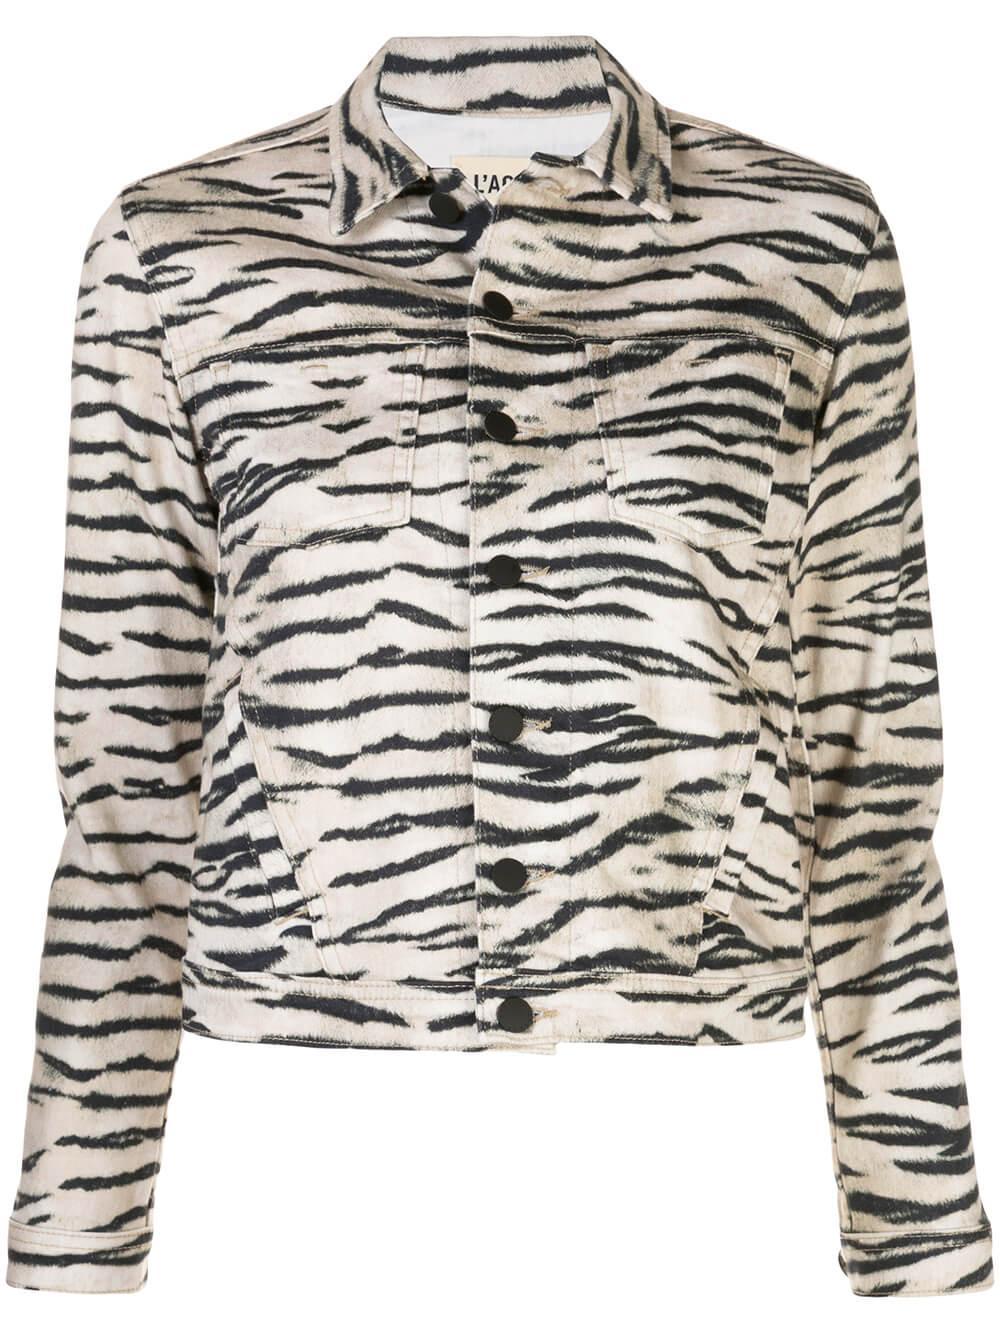 Celine Zebra Print Slim Jacket Wildcat Item # 1321WCK